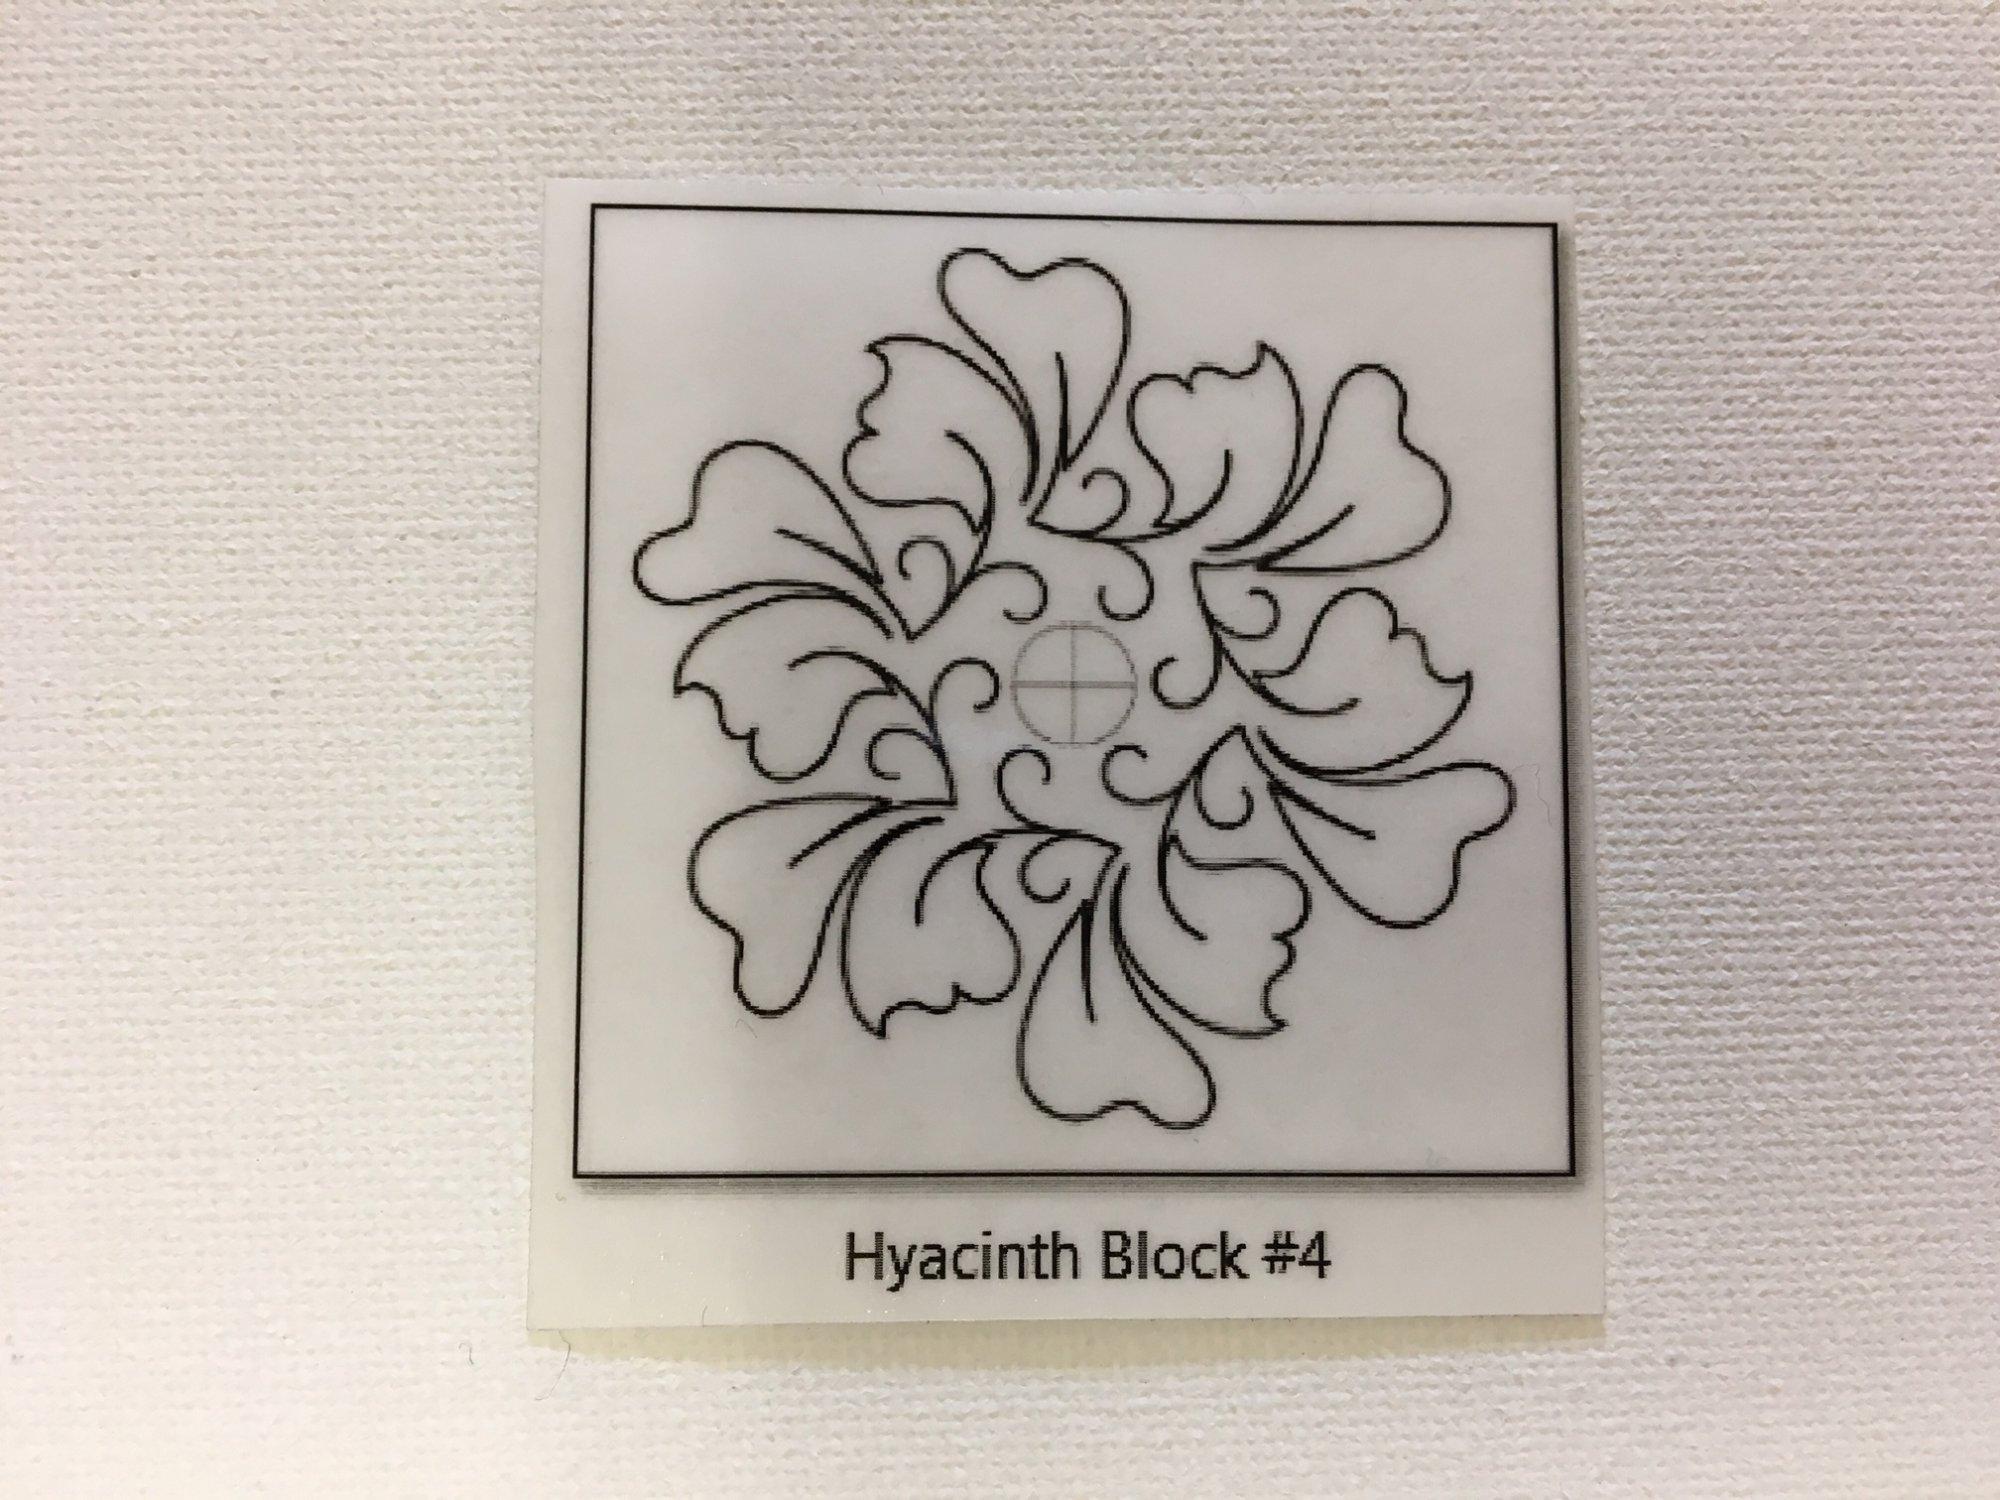 Hyacinth Block